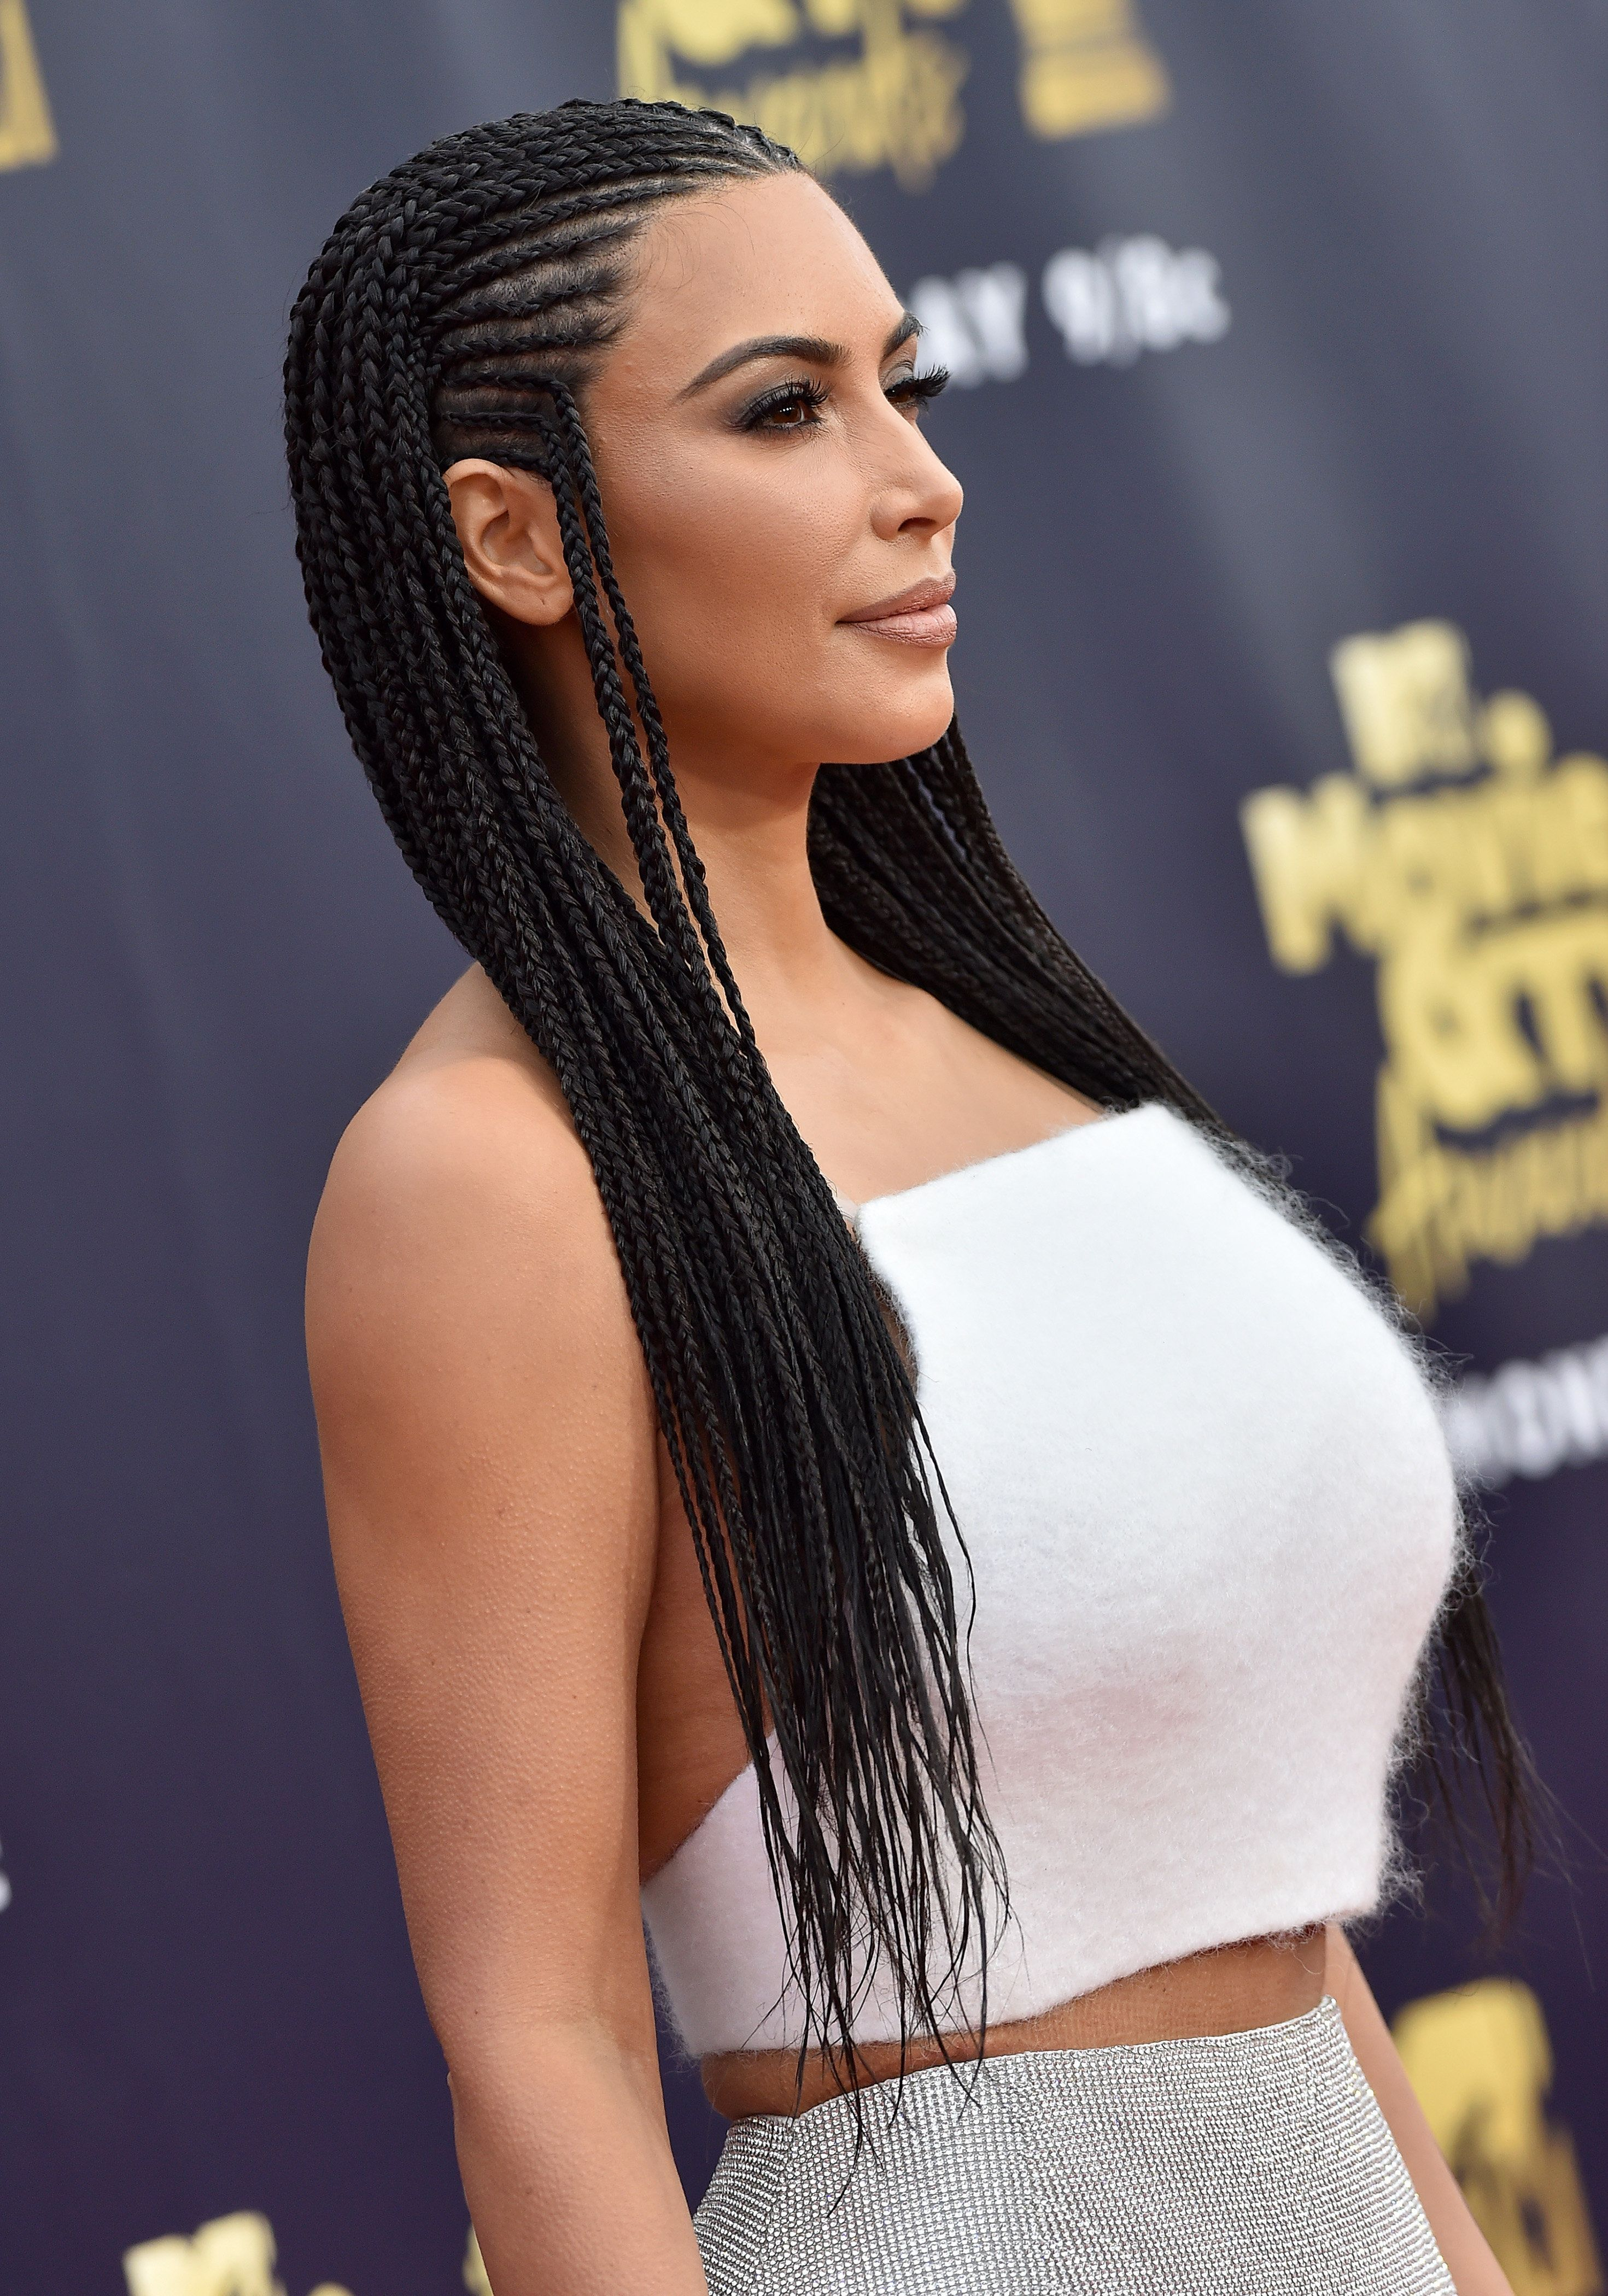 Kim Kardashian Tries To Defend Wearing Fulani Braids To The